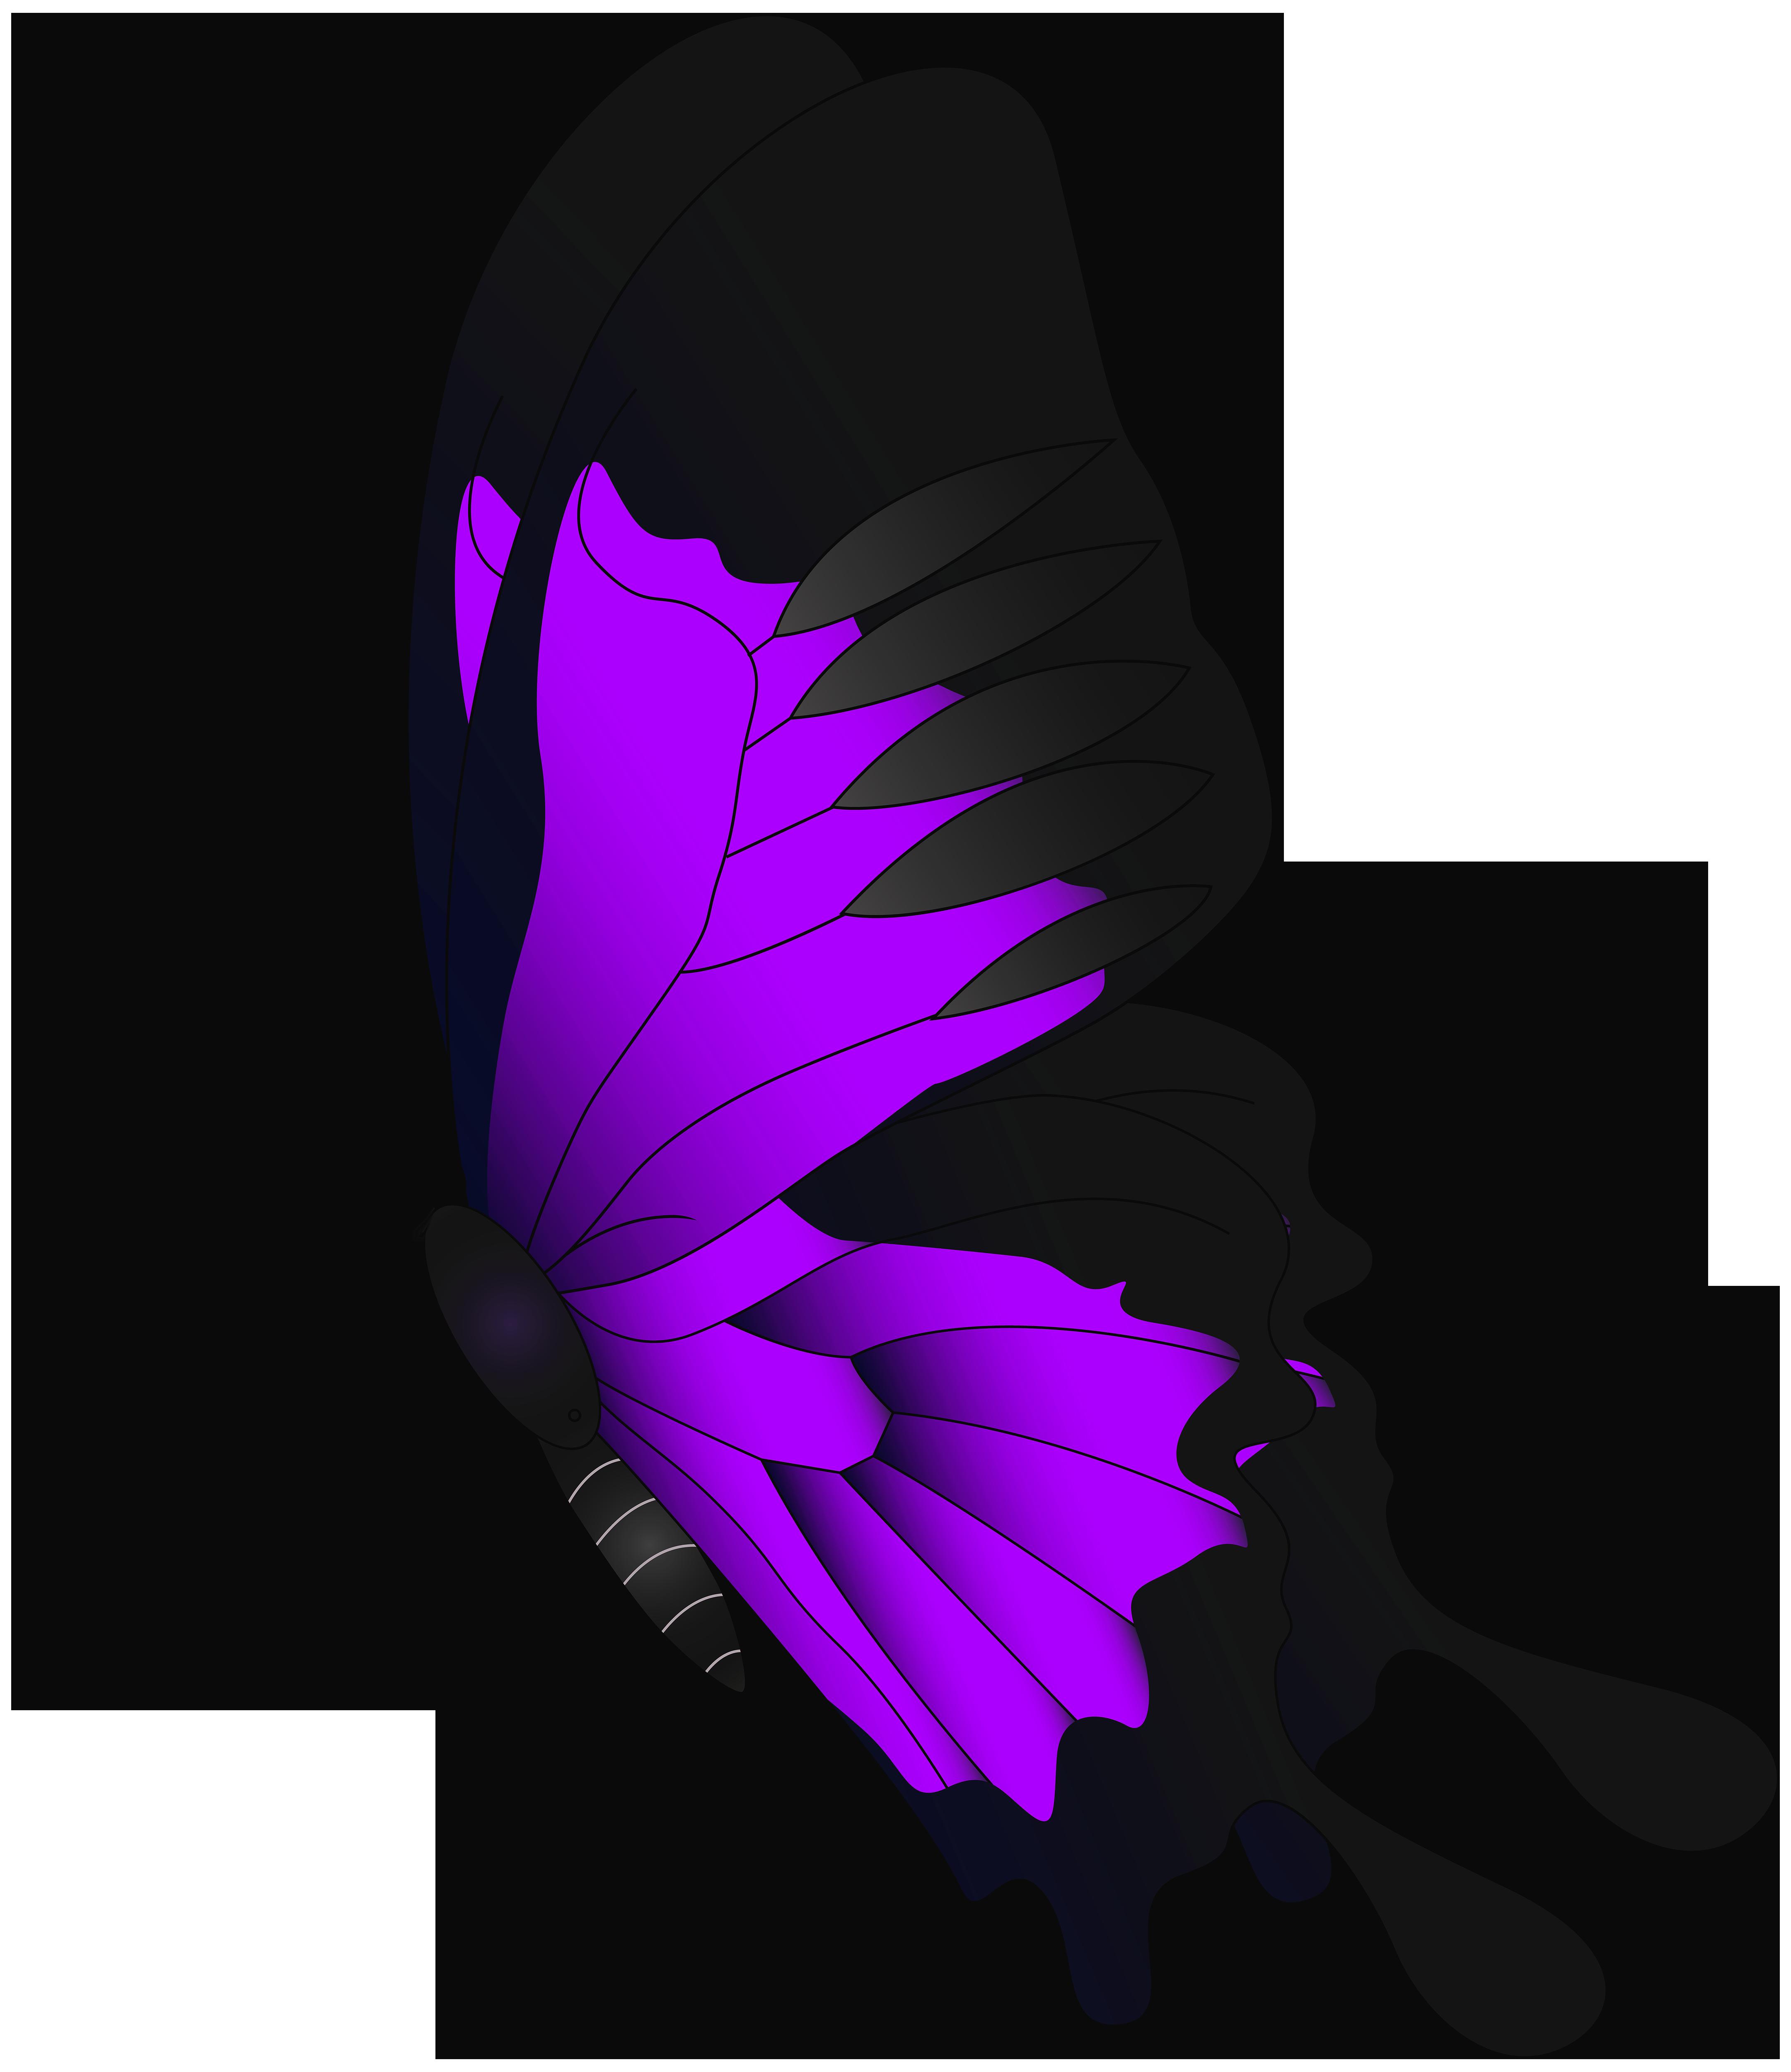 Butterfly chroma key flying. Keys clipart purple